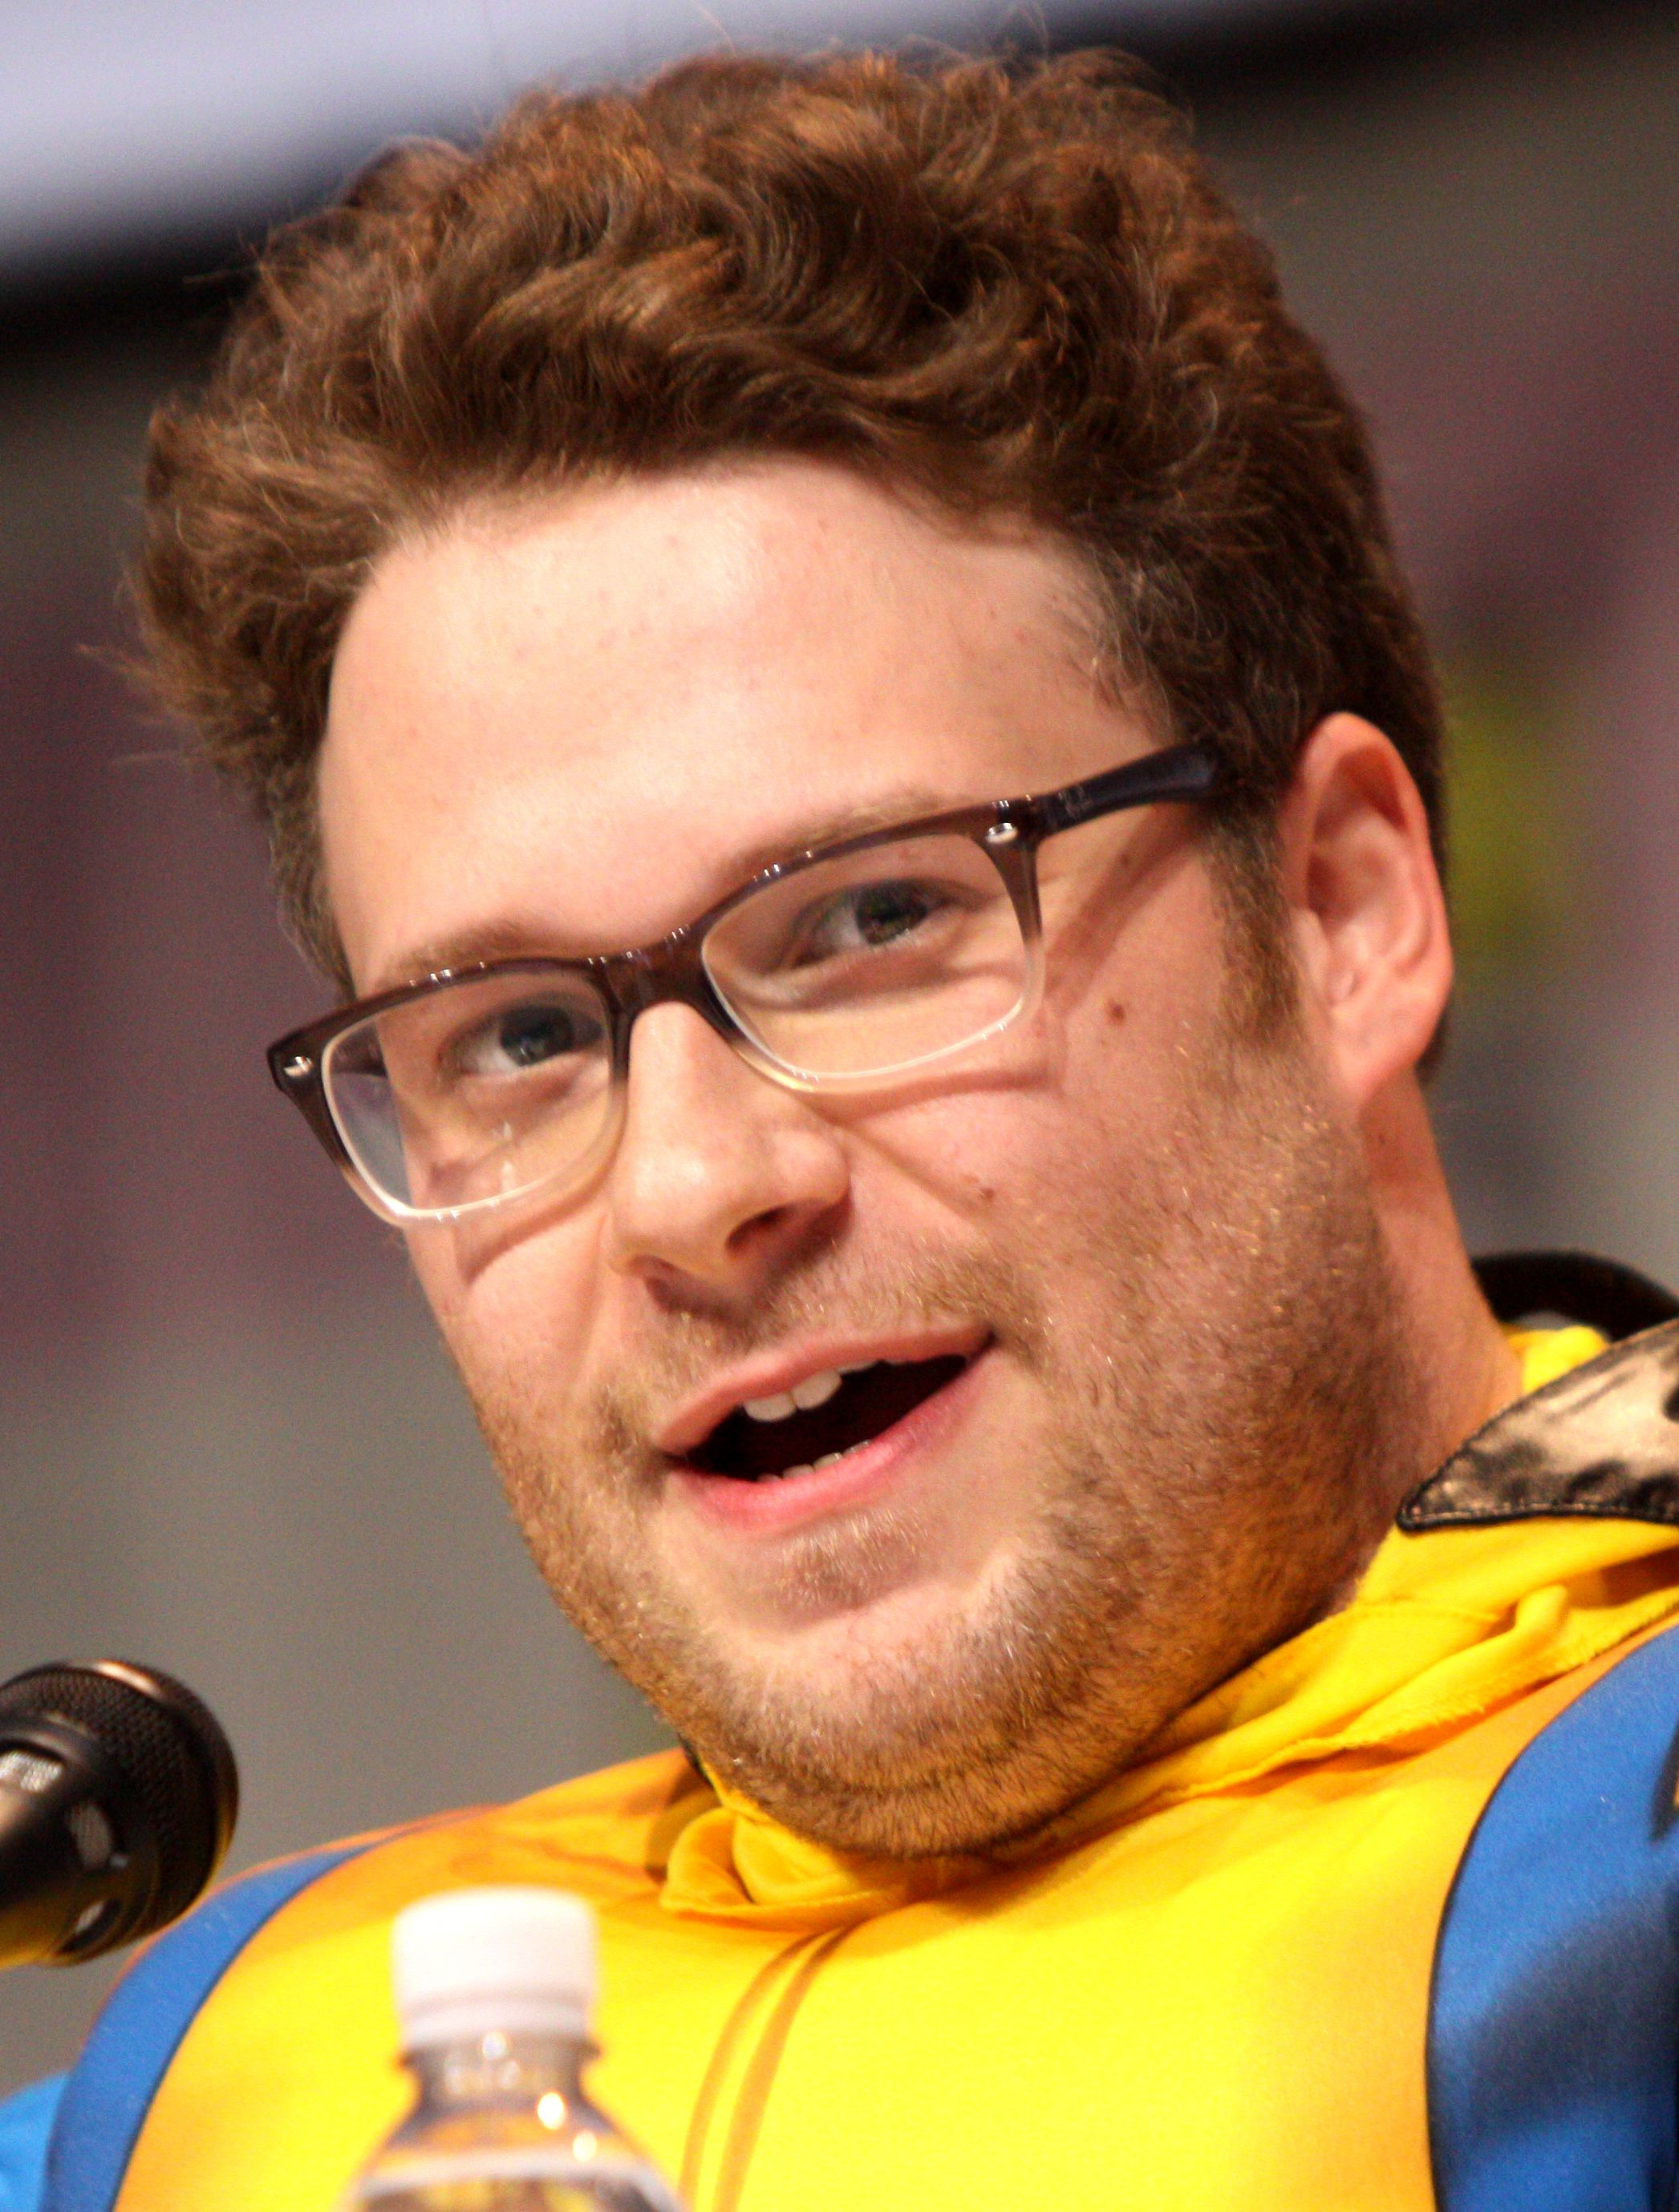 Seth Rogan ugggghhhh, fine he's been okay Jon favreau